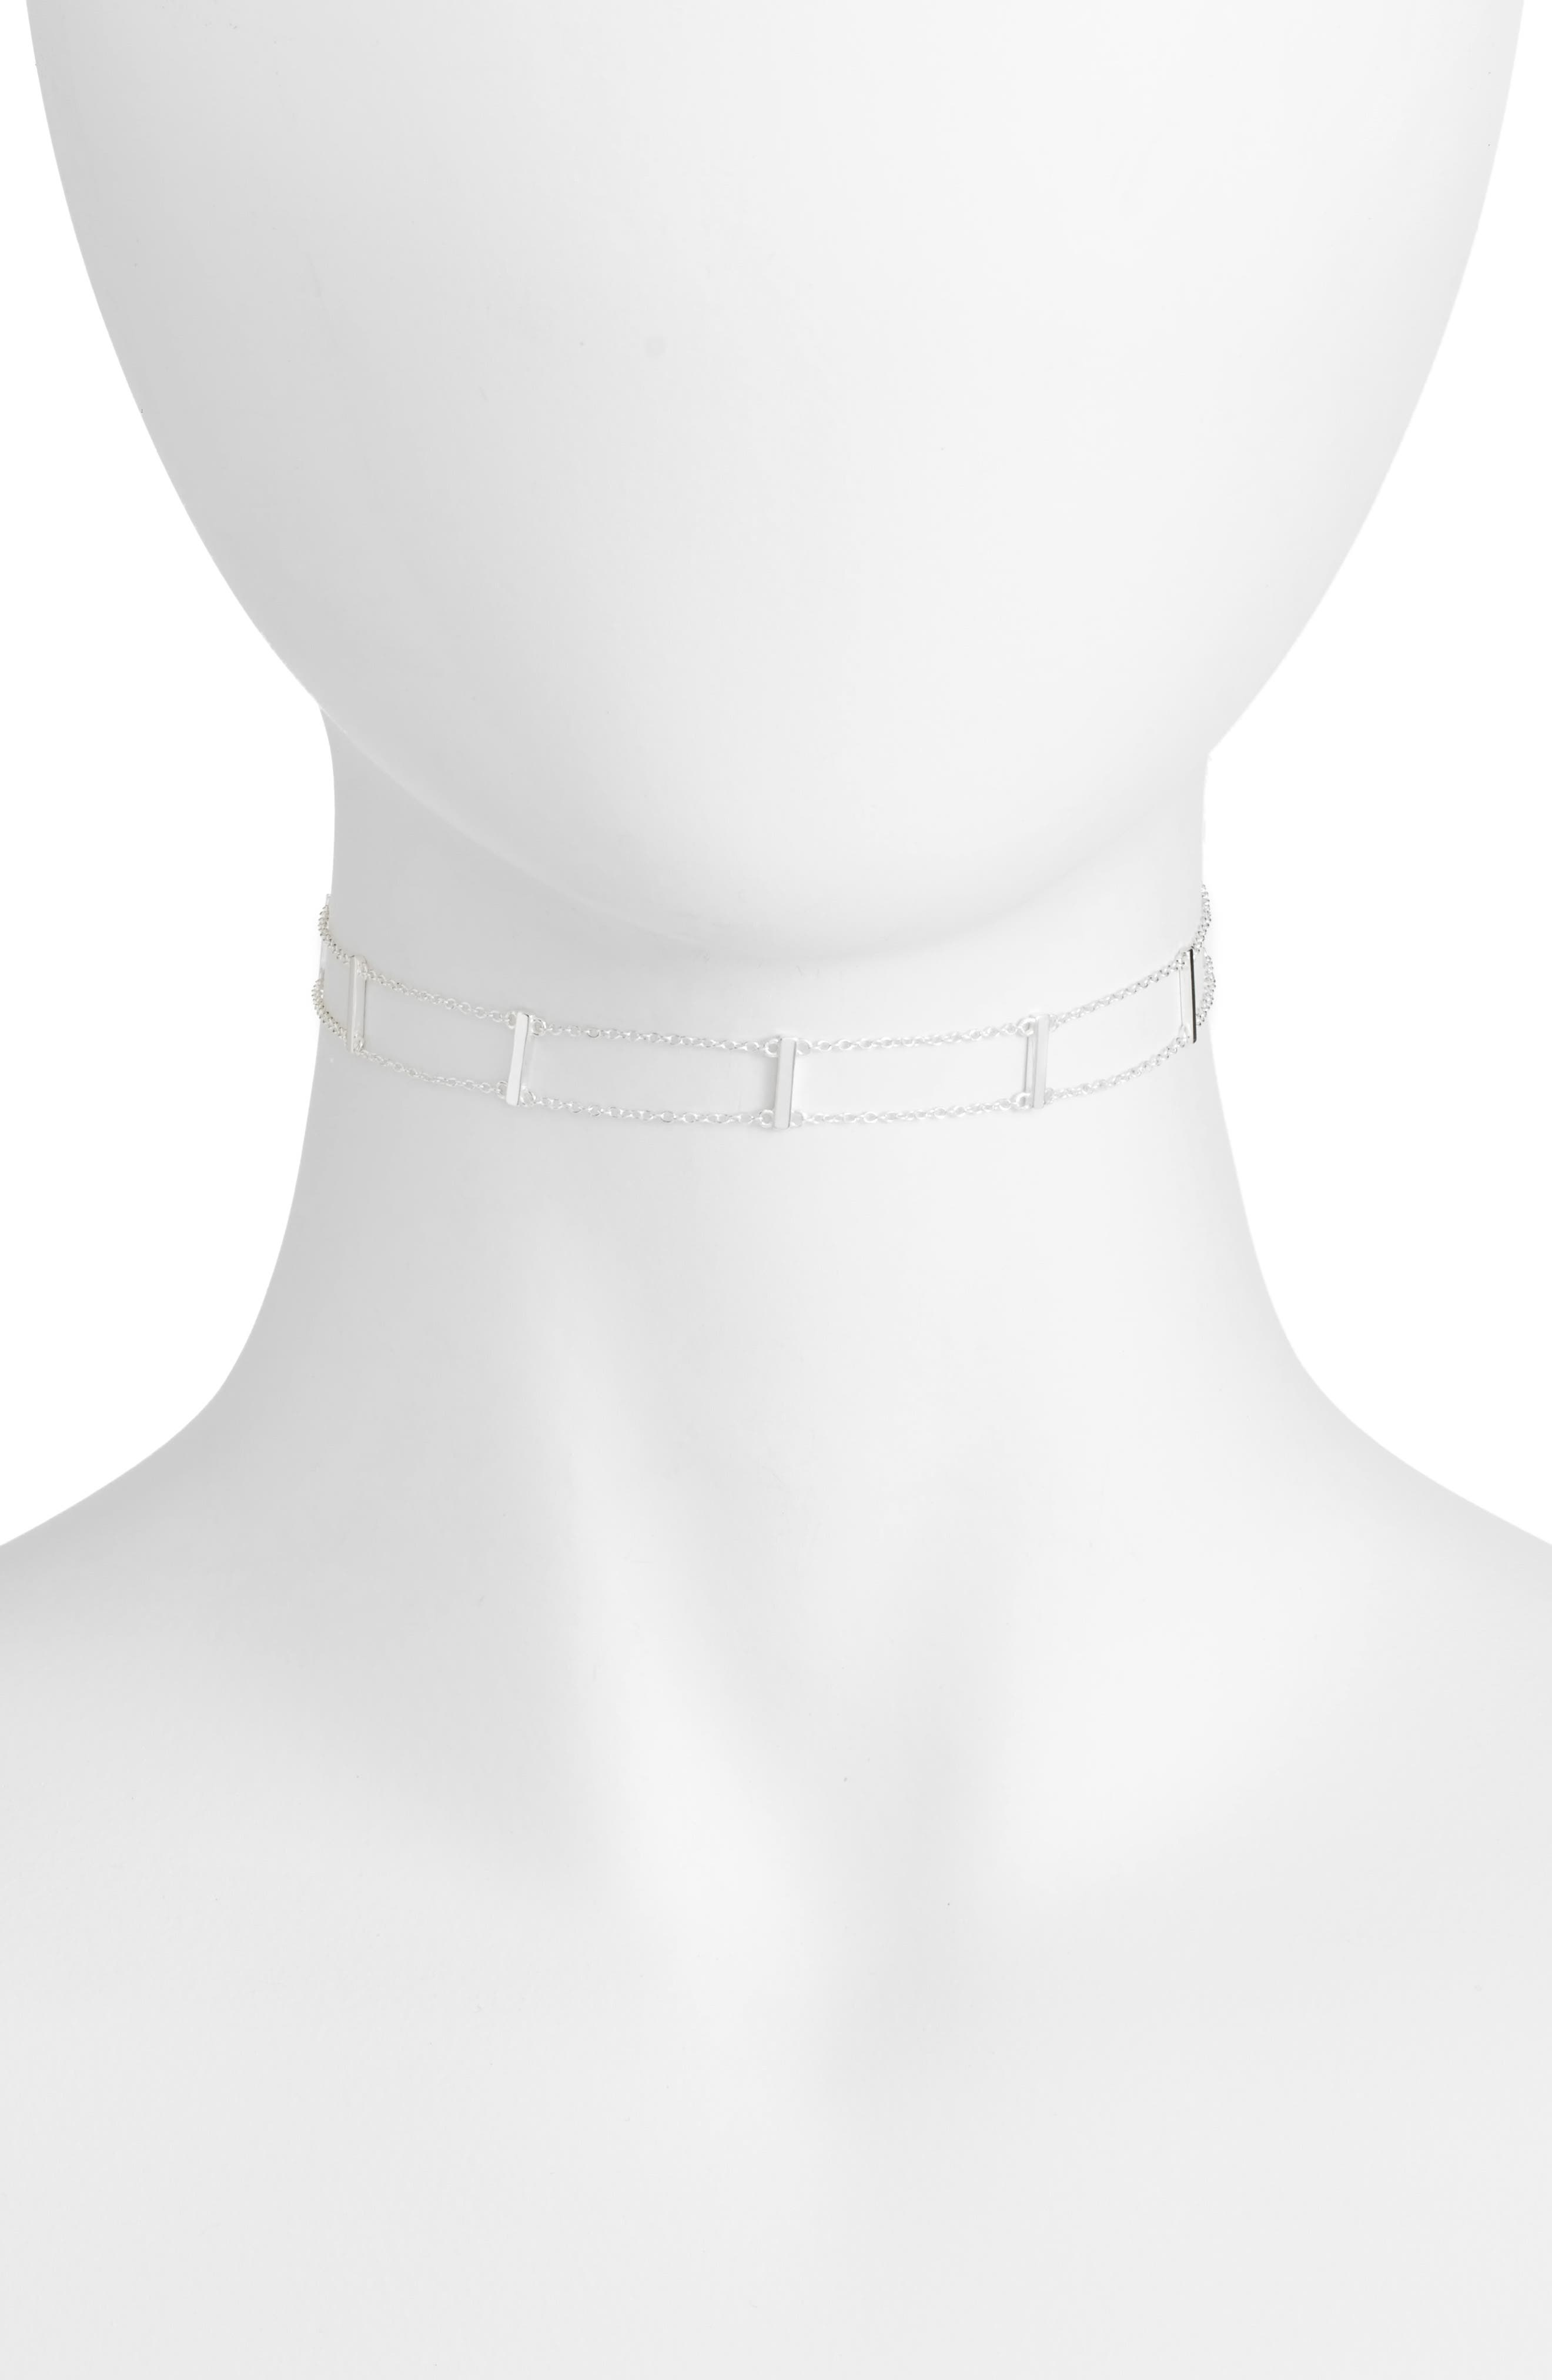 Main Image - Argento Vivo Chain Choker